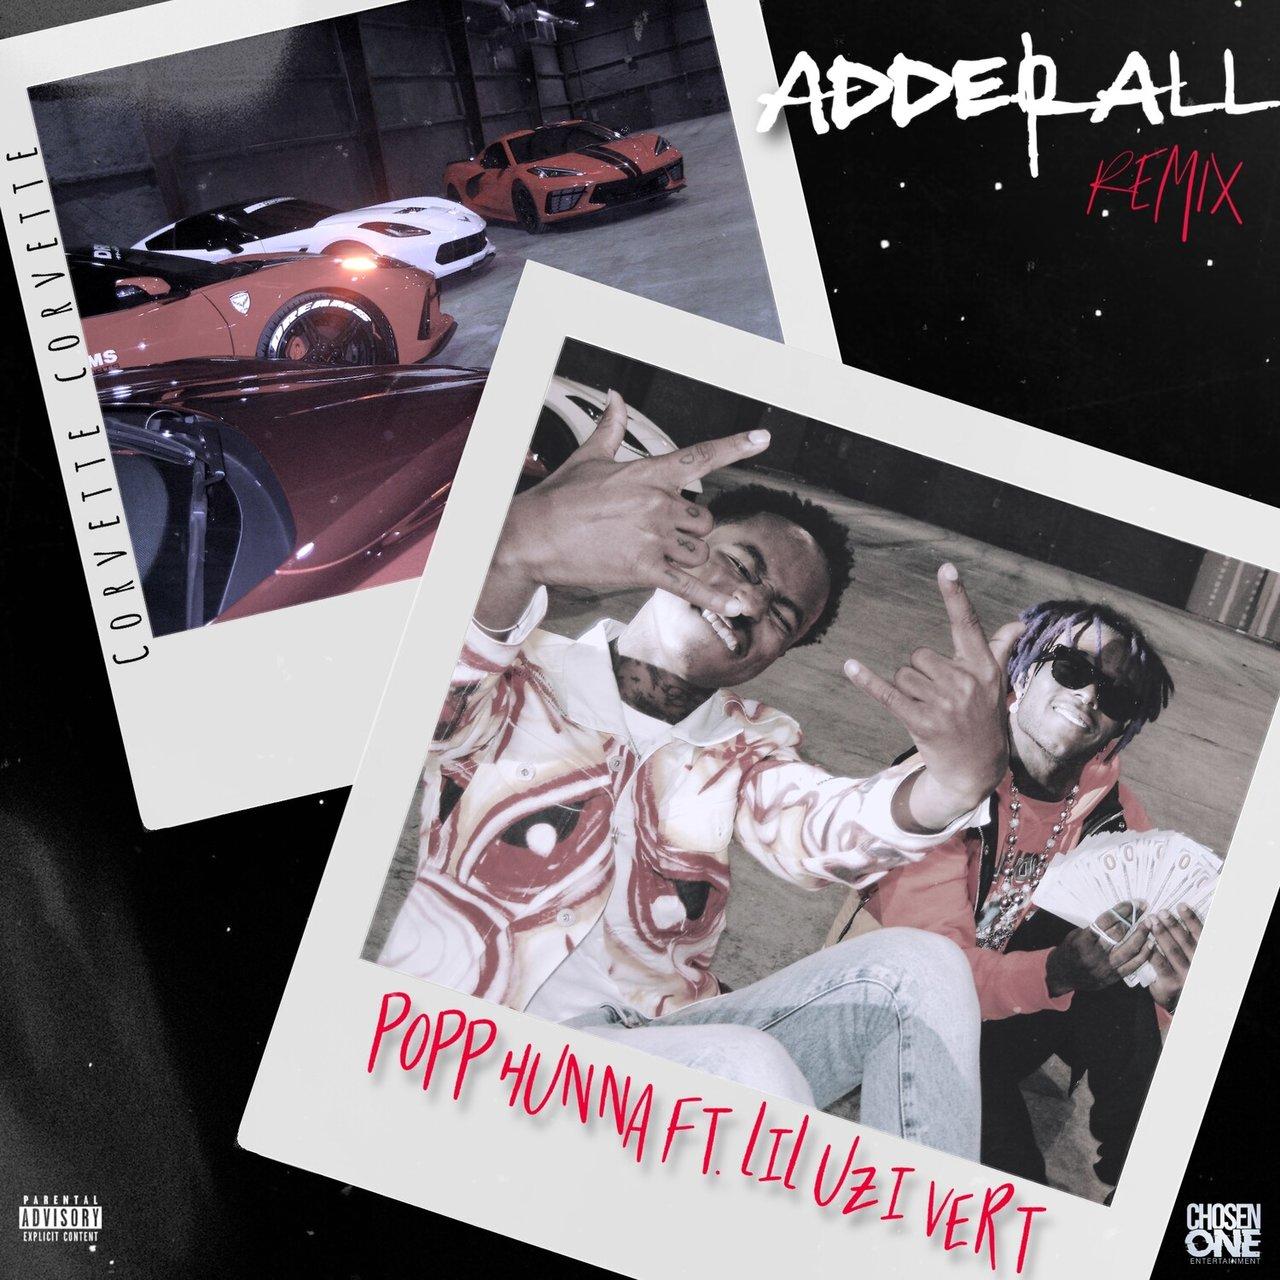 Popp Hunna - Adderall (Corvette Corvette) (Remix) (ft. Lil Uzi Vert) (Cover)